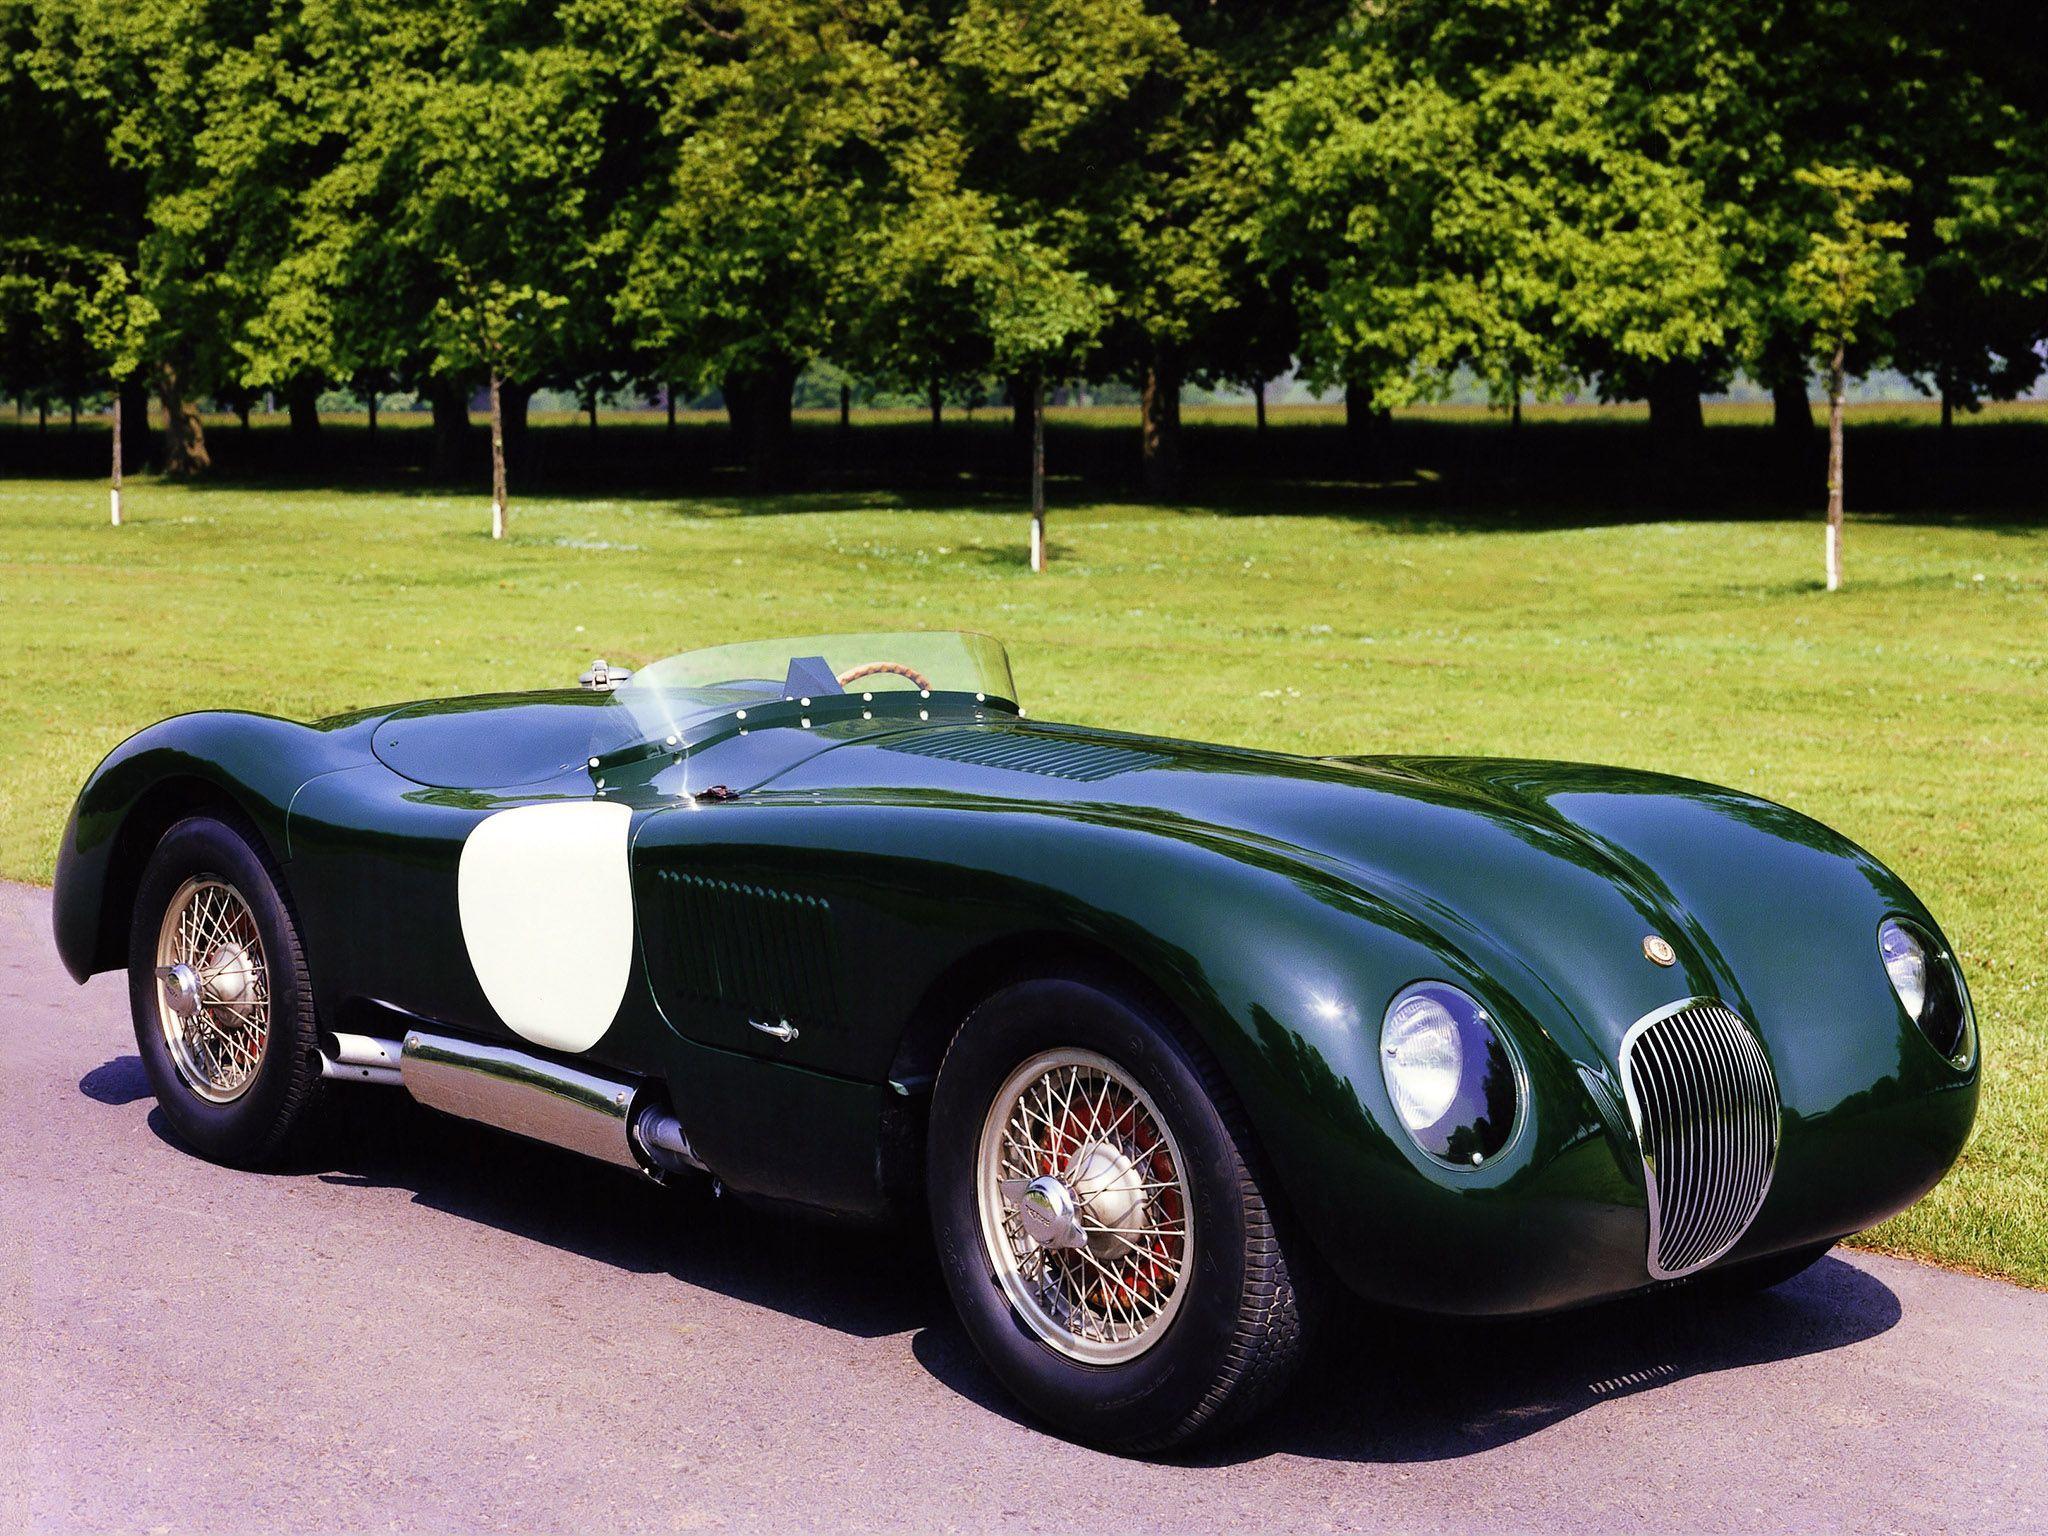 National Racing Colors Jaguar British Racing Green Classic Cars